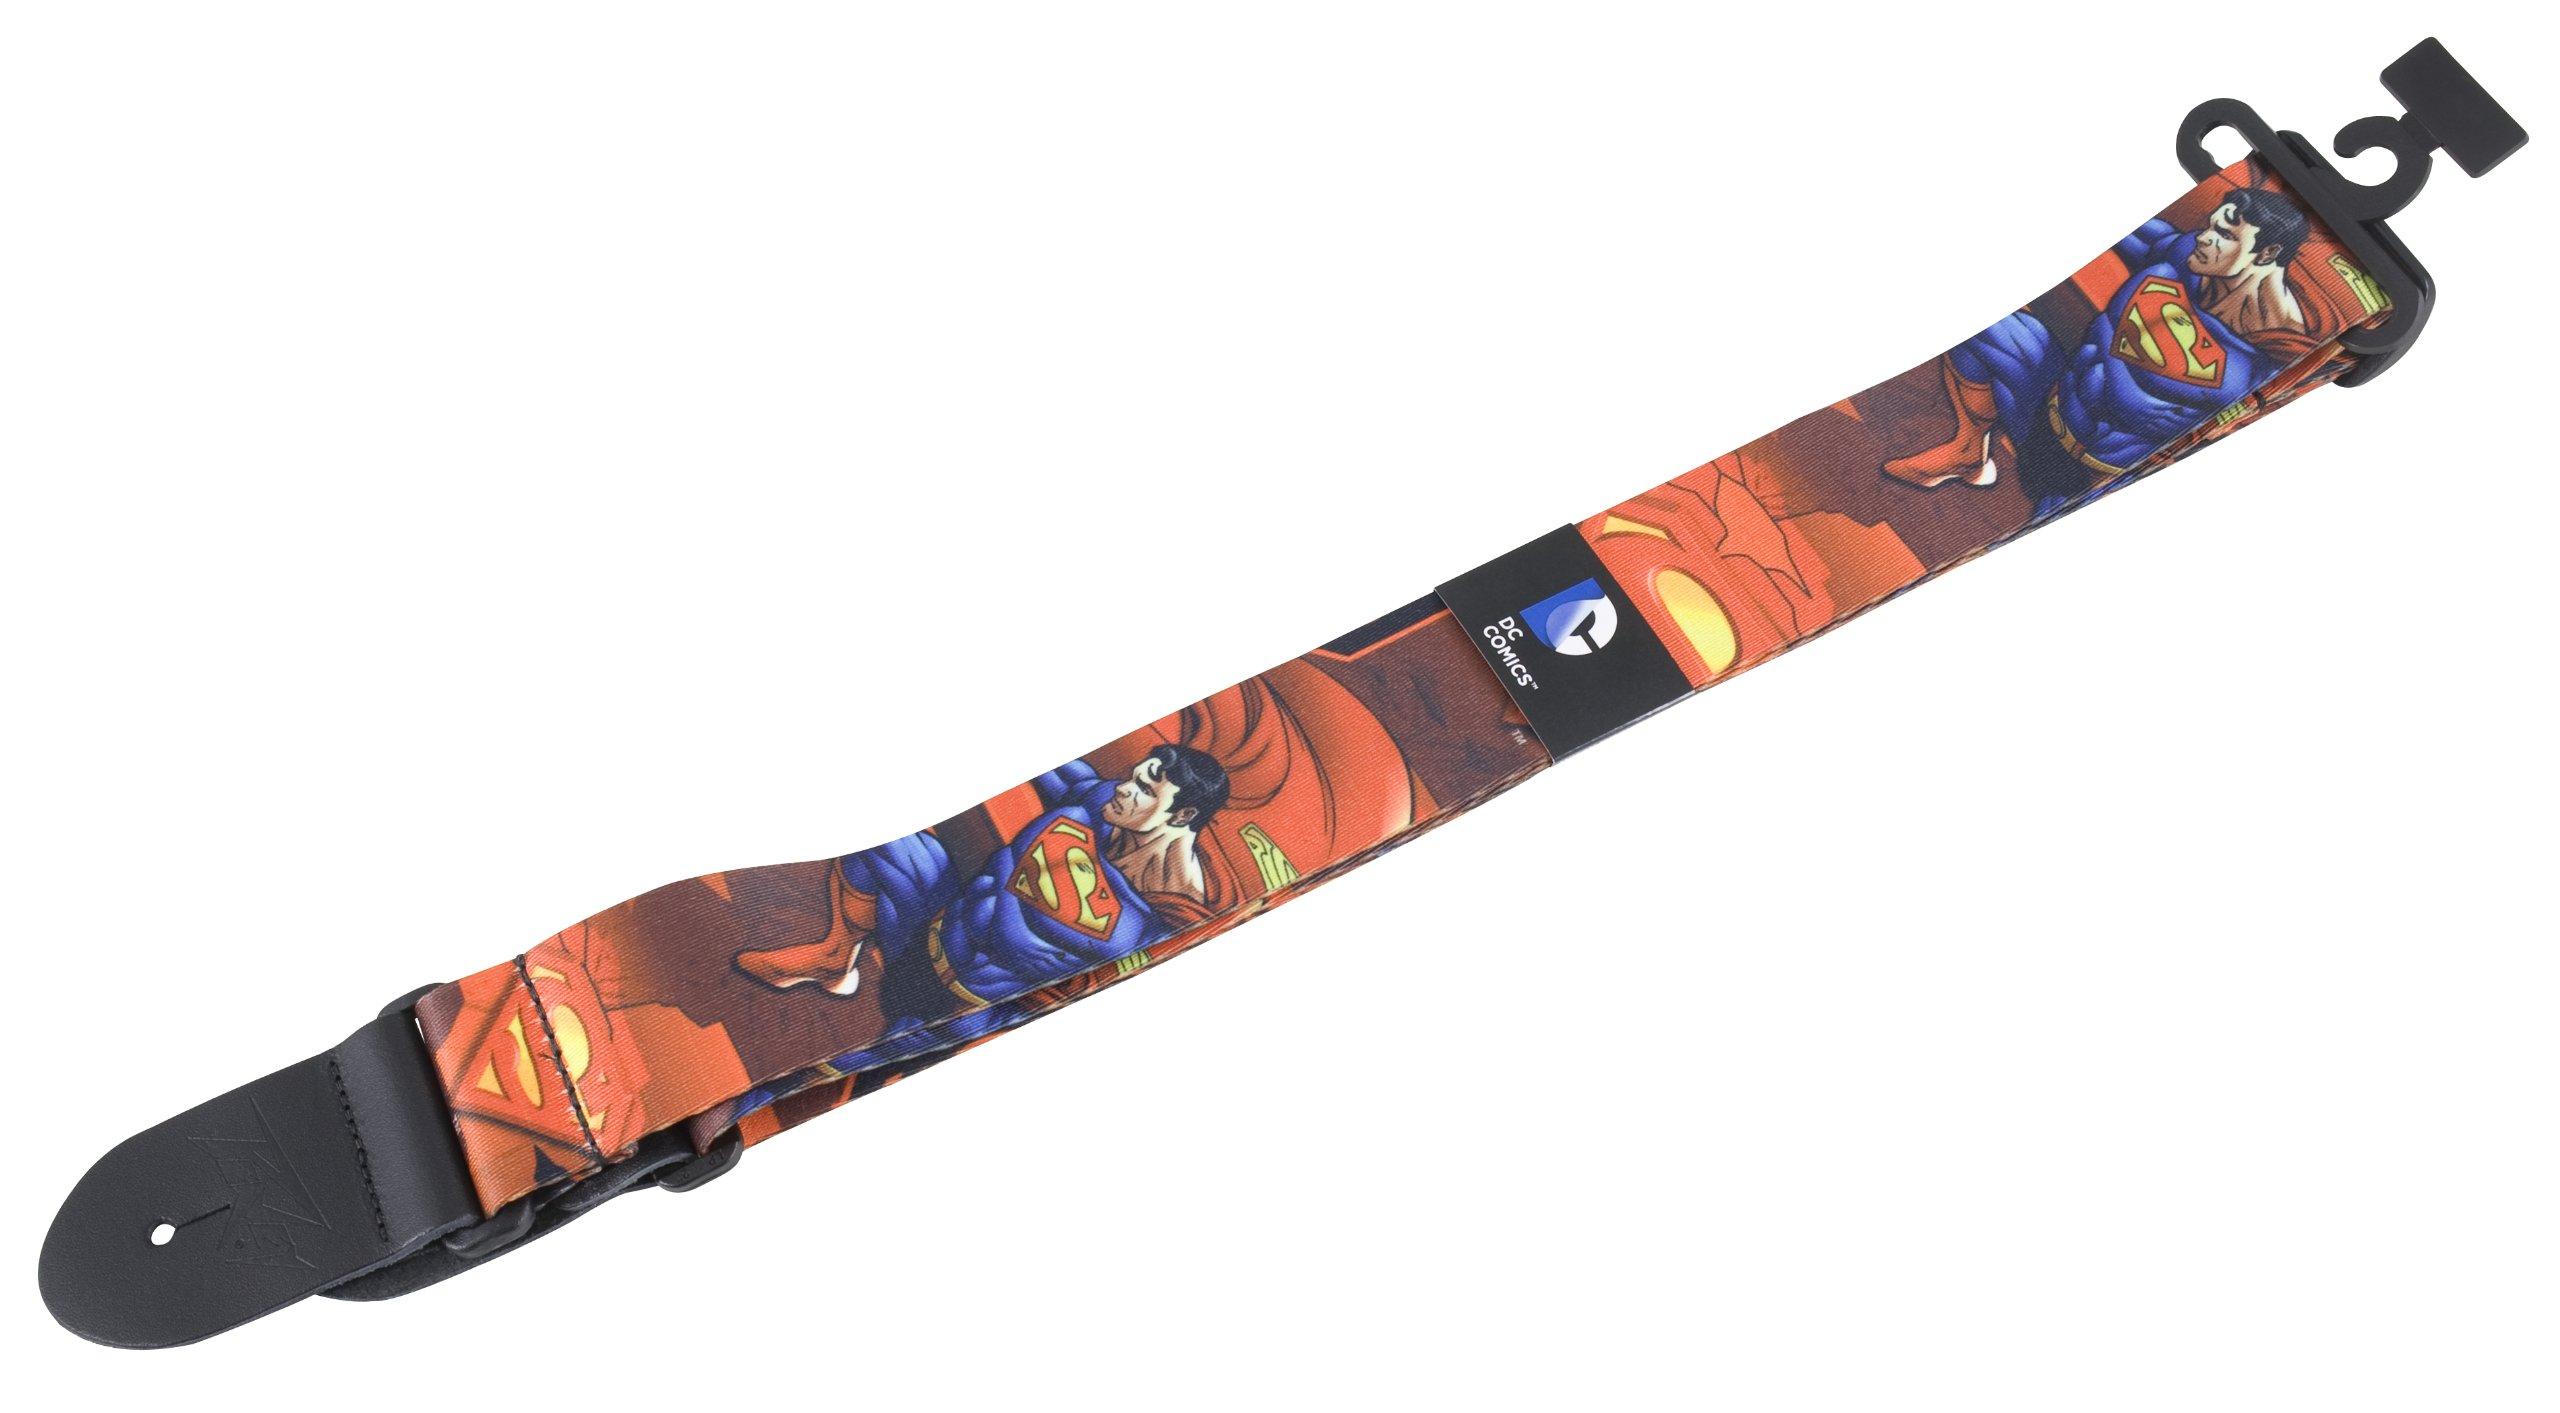 Peavey 03020890 DC Superman Guitar Strap by Peavey